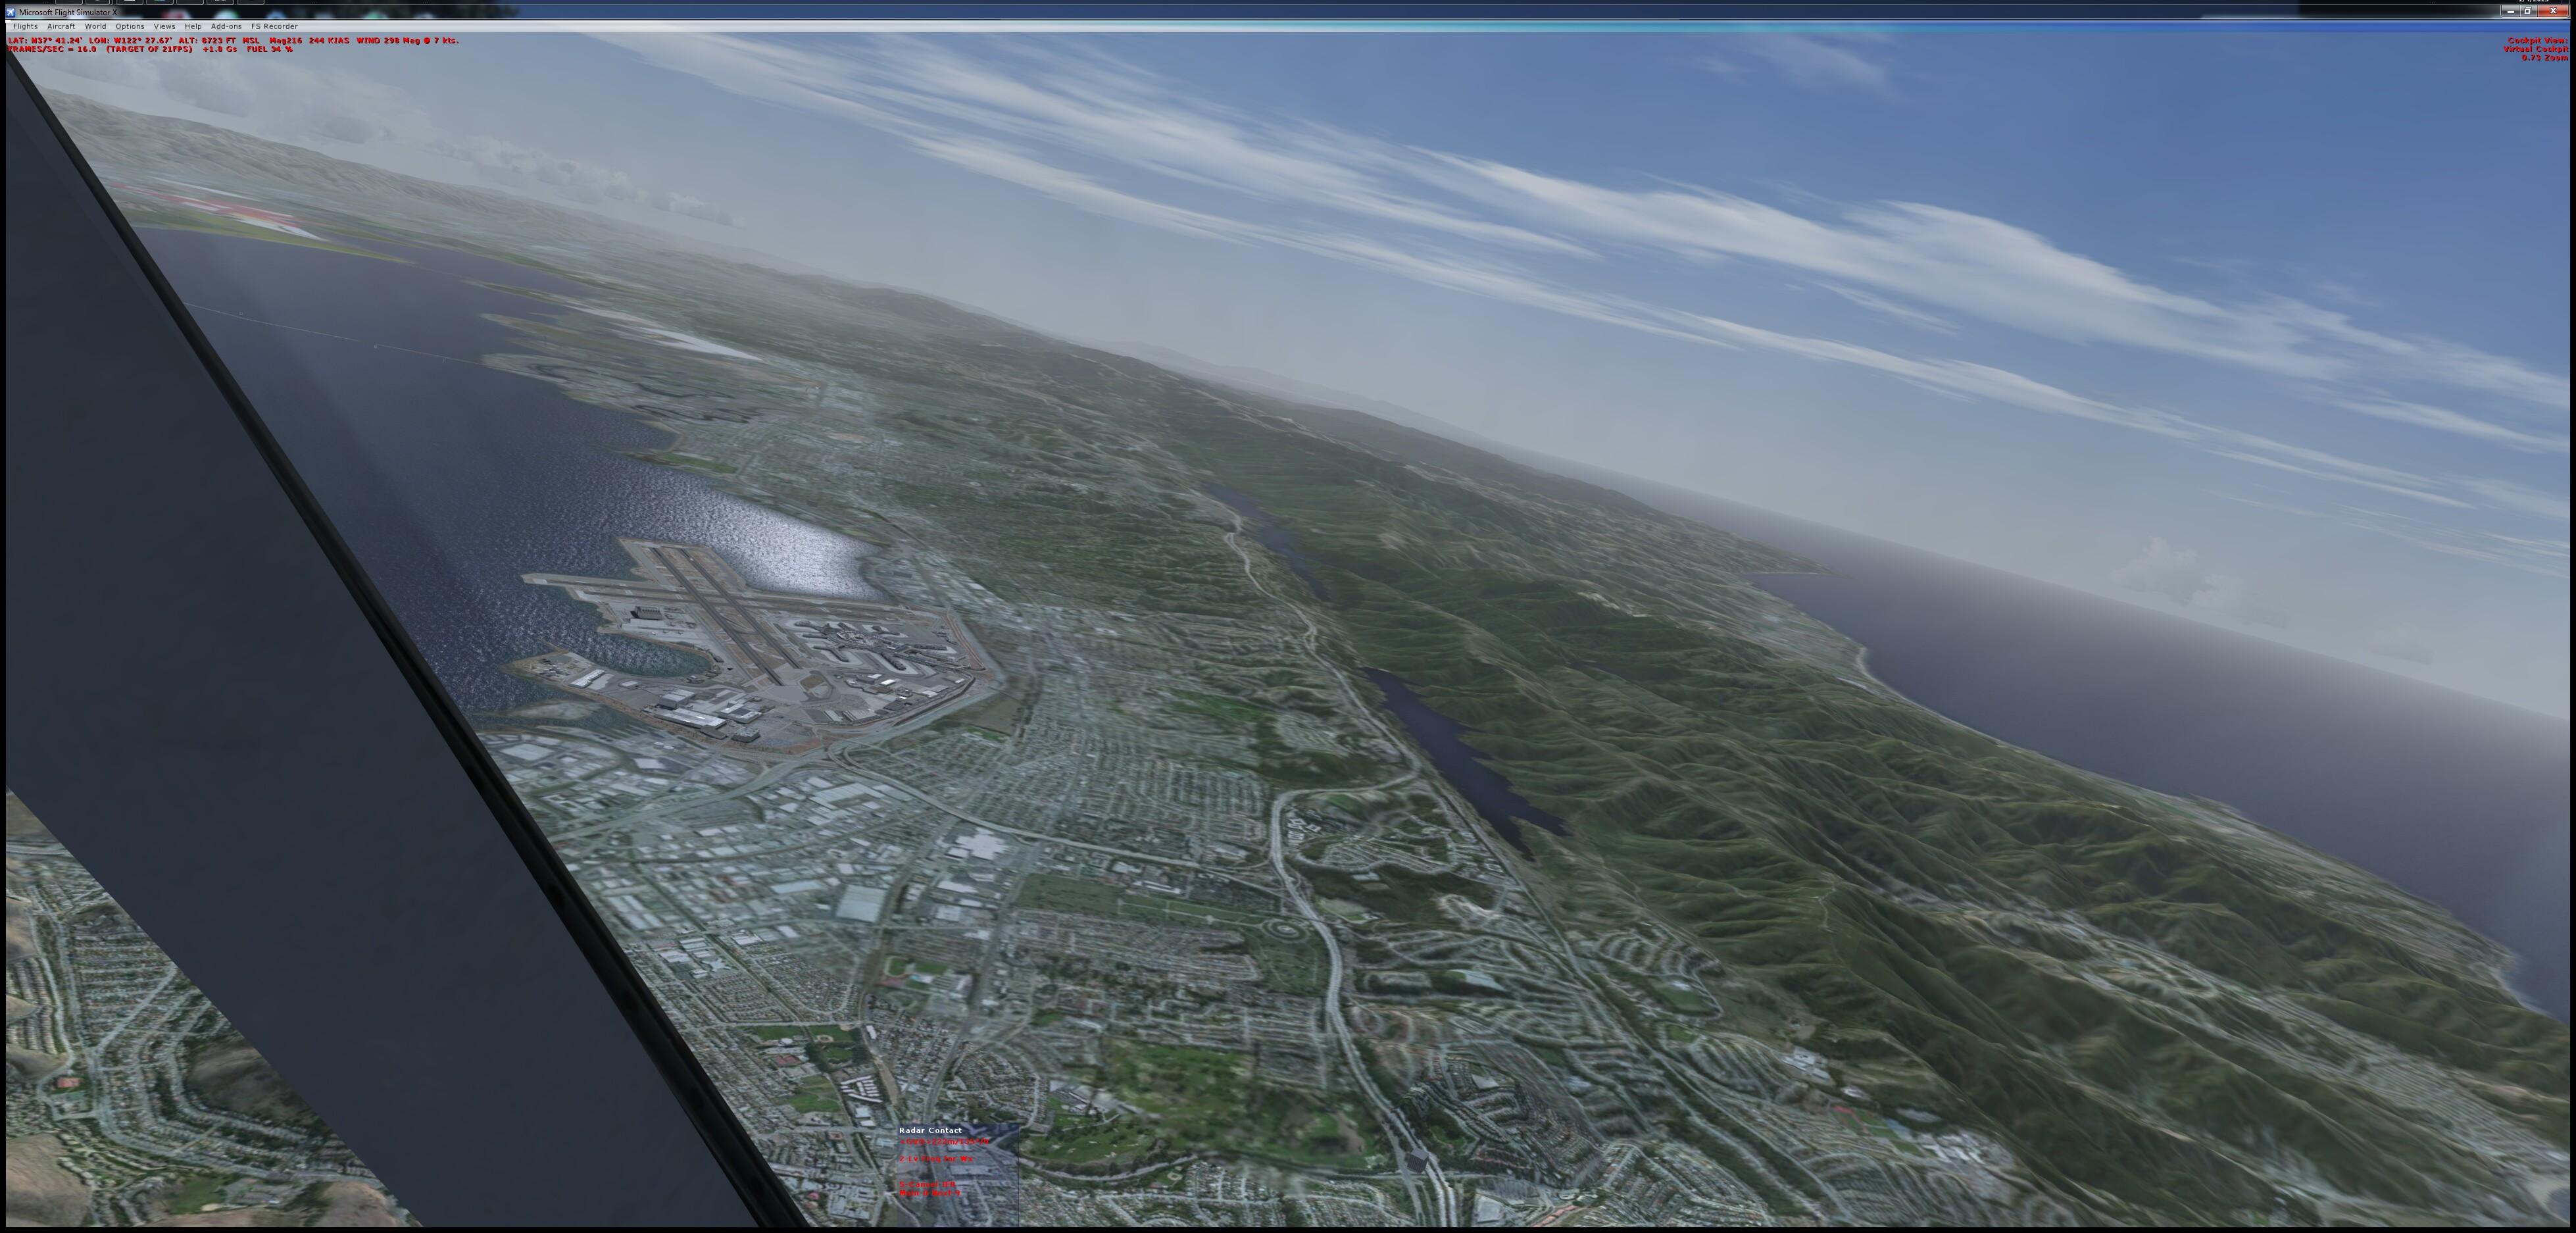 ScreenshotsKSFP-KLAX-09.jpg